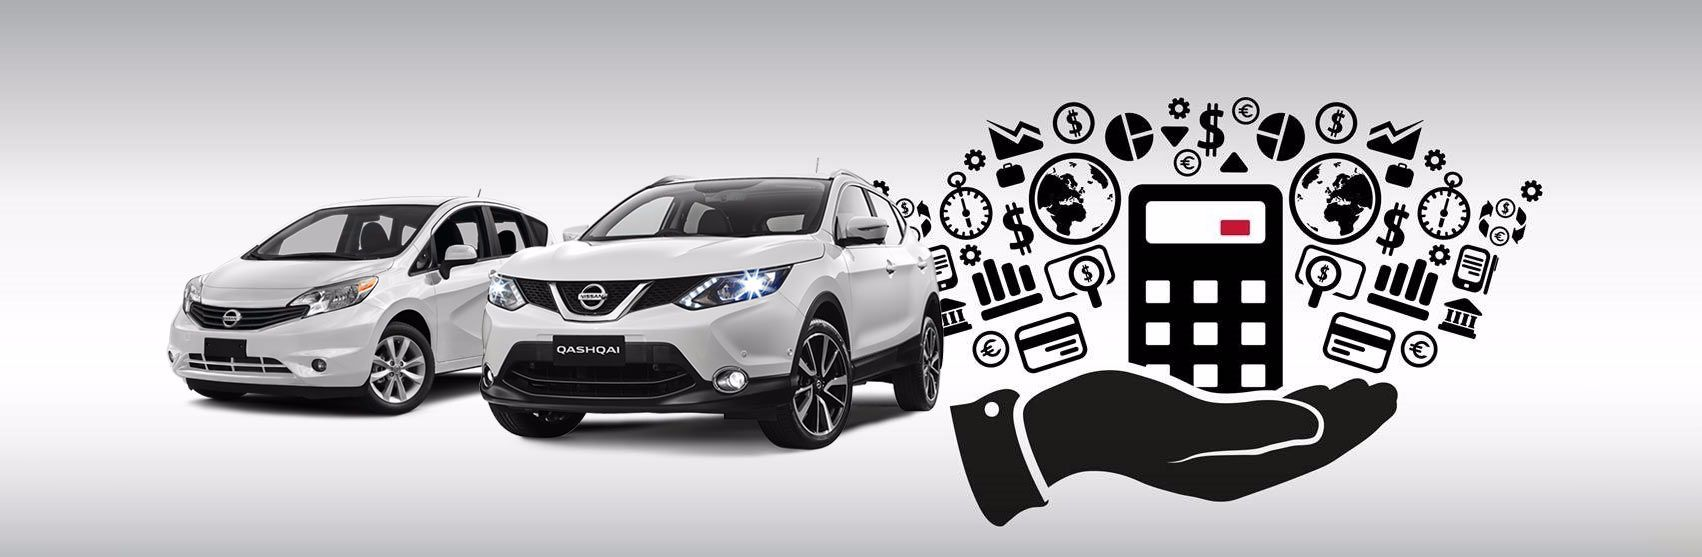 Nissan Finance And Used Car Finance Hamilton Garage